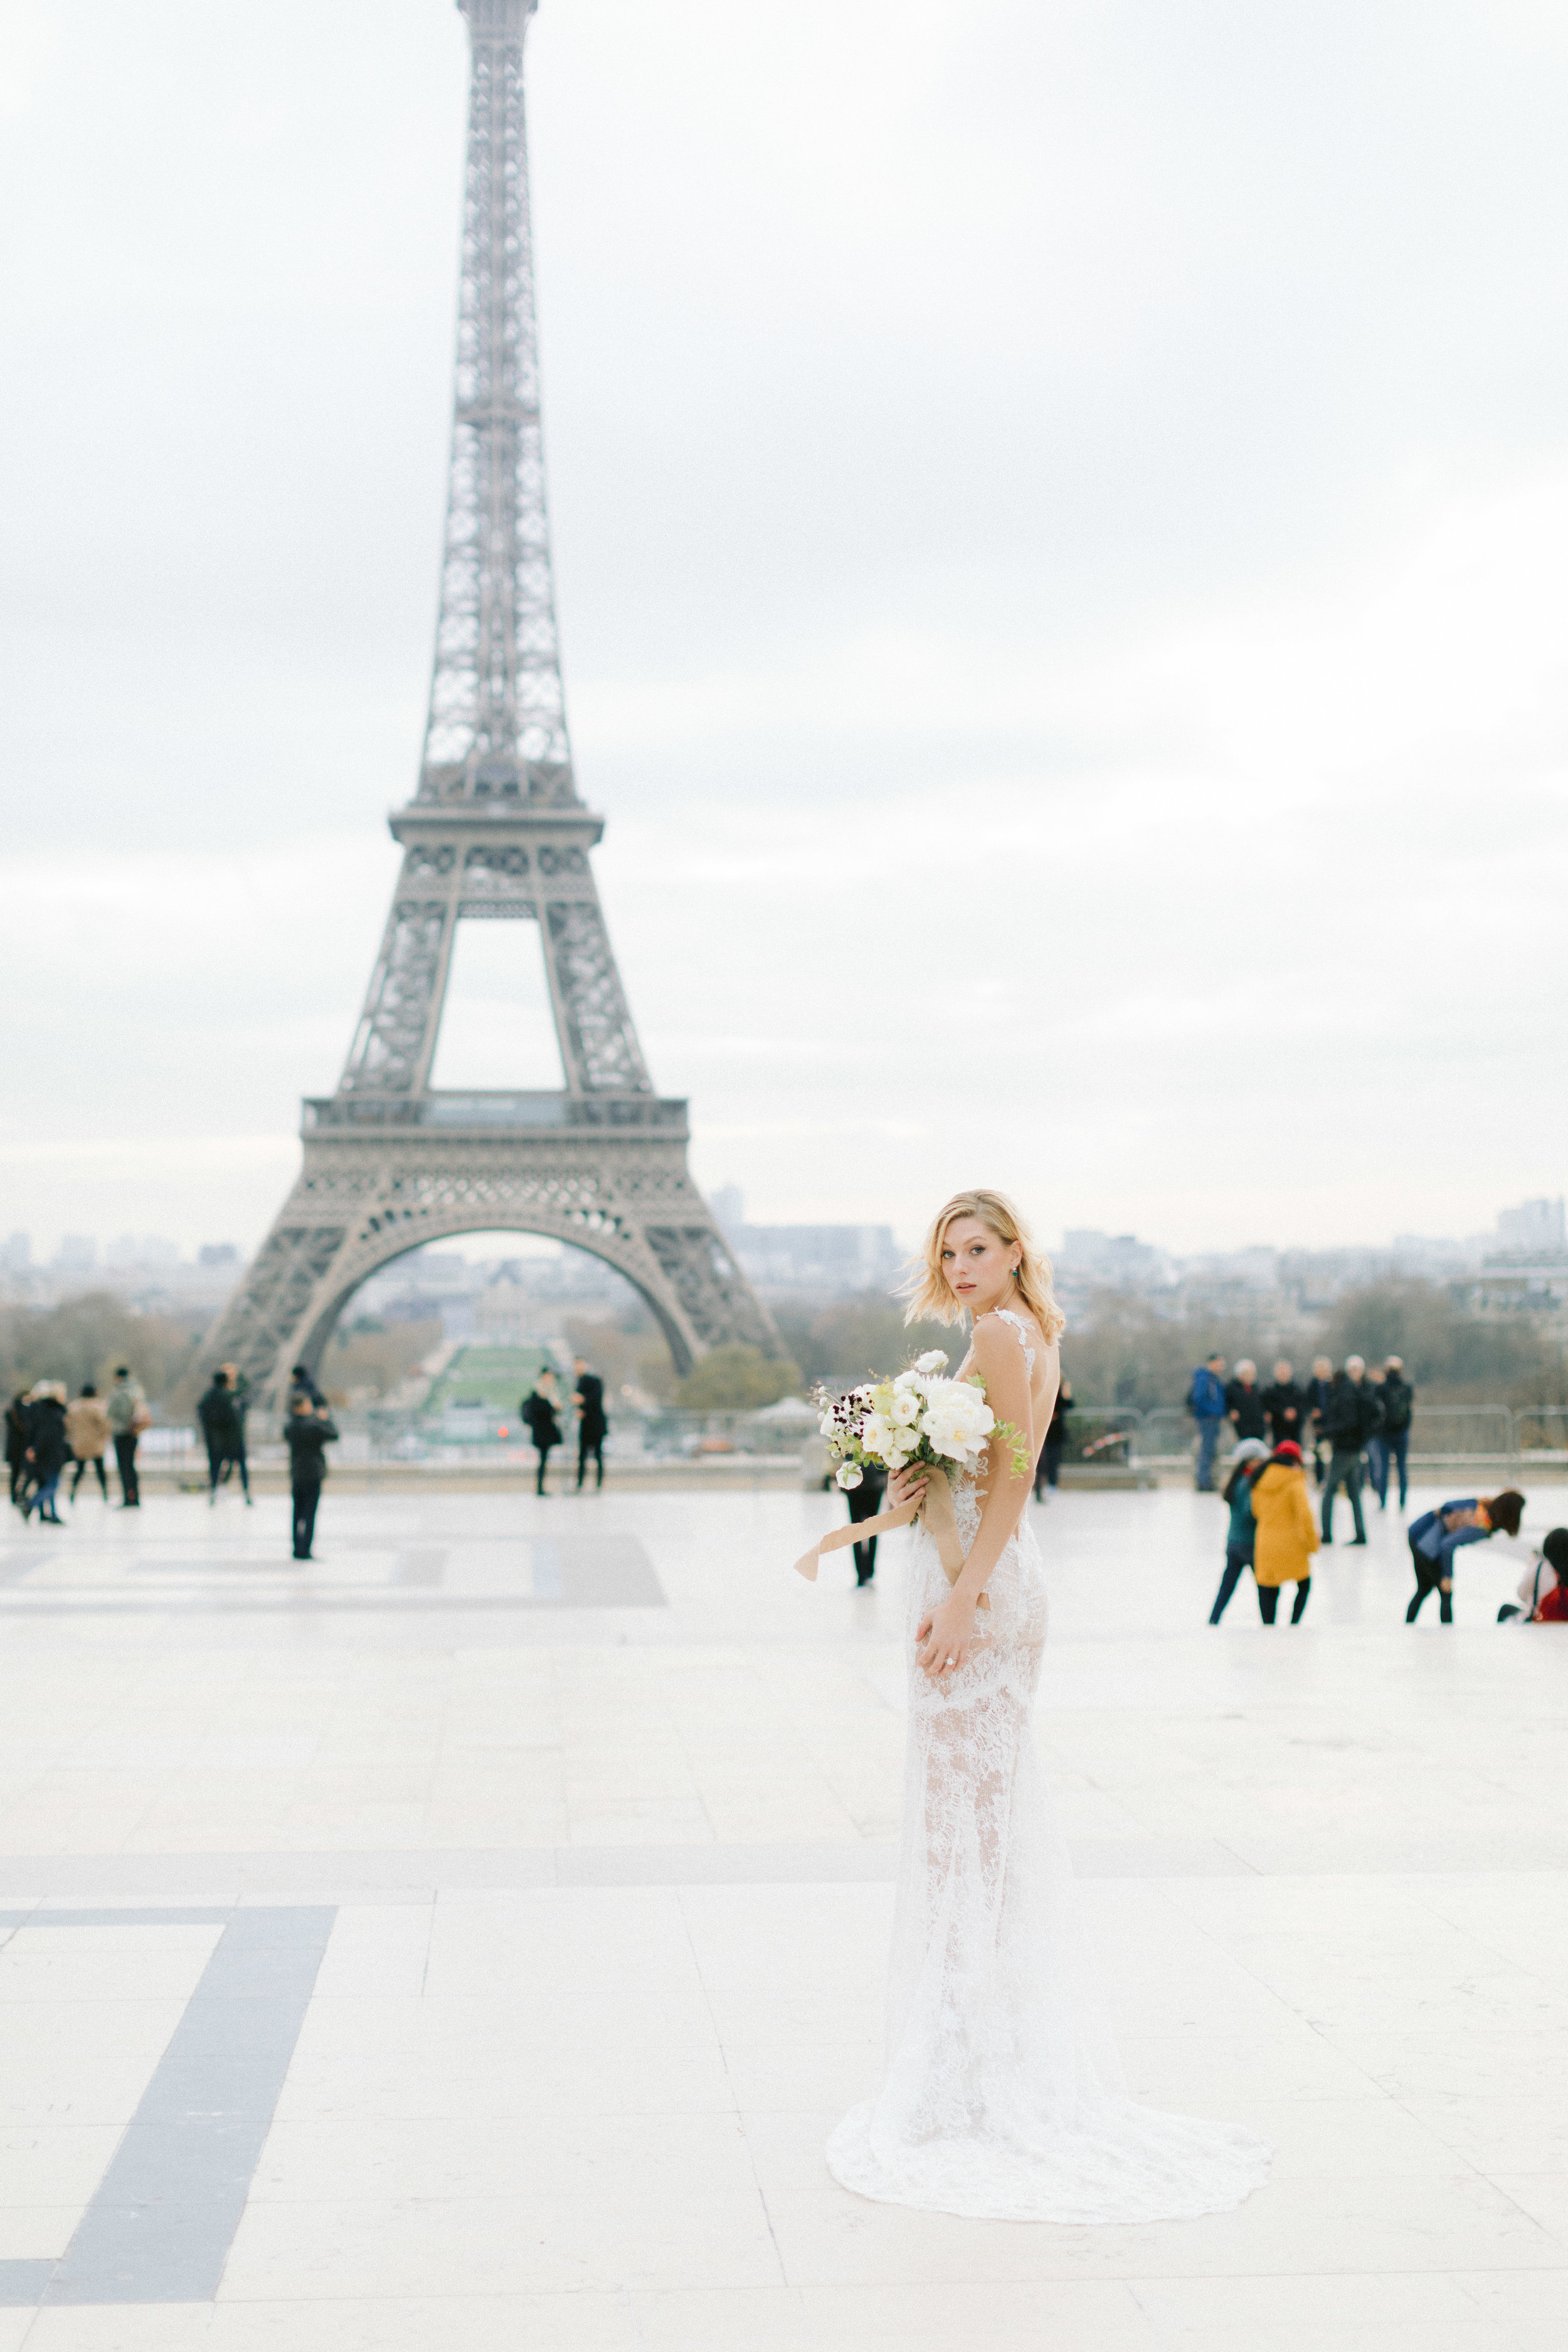 JennyQuicksallPhotography_www.jennyquicksall.com_ParisFranceEditorial_-148.jpg